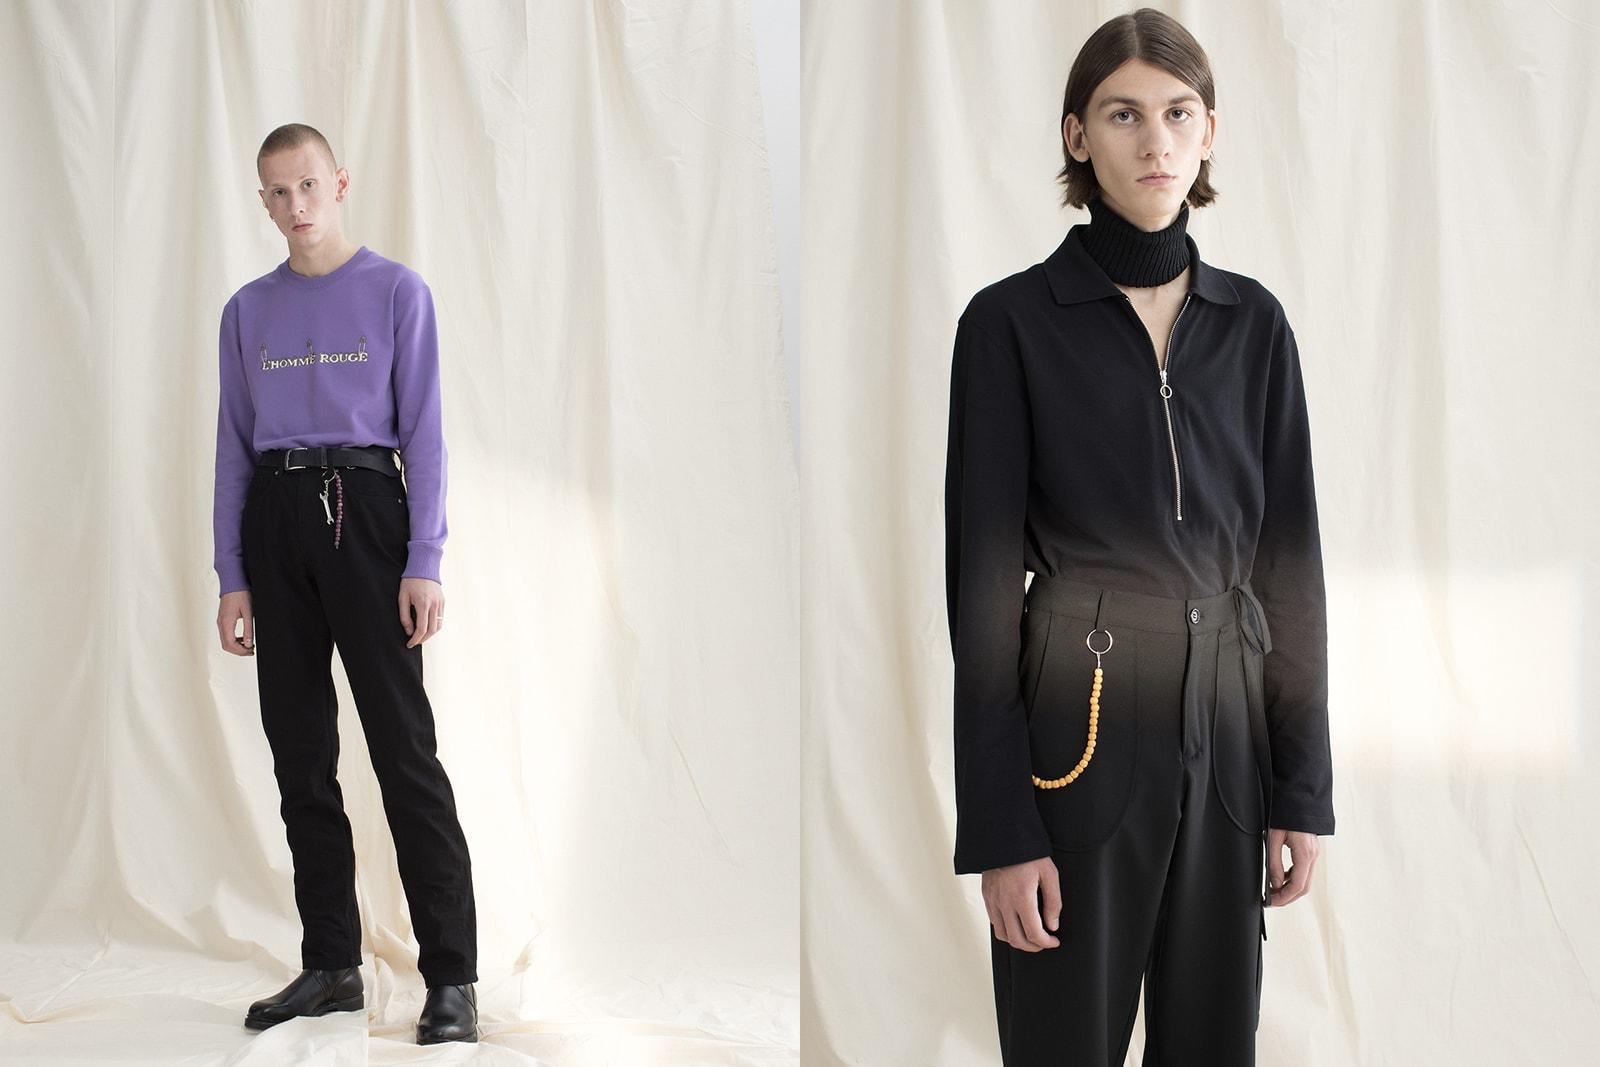 L'HOMME ROUGE interview brand introduction Sweden Scandinavia minimalism